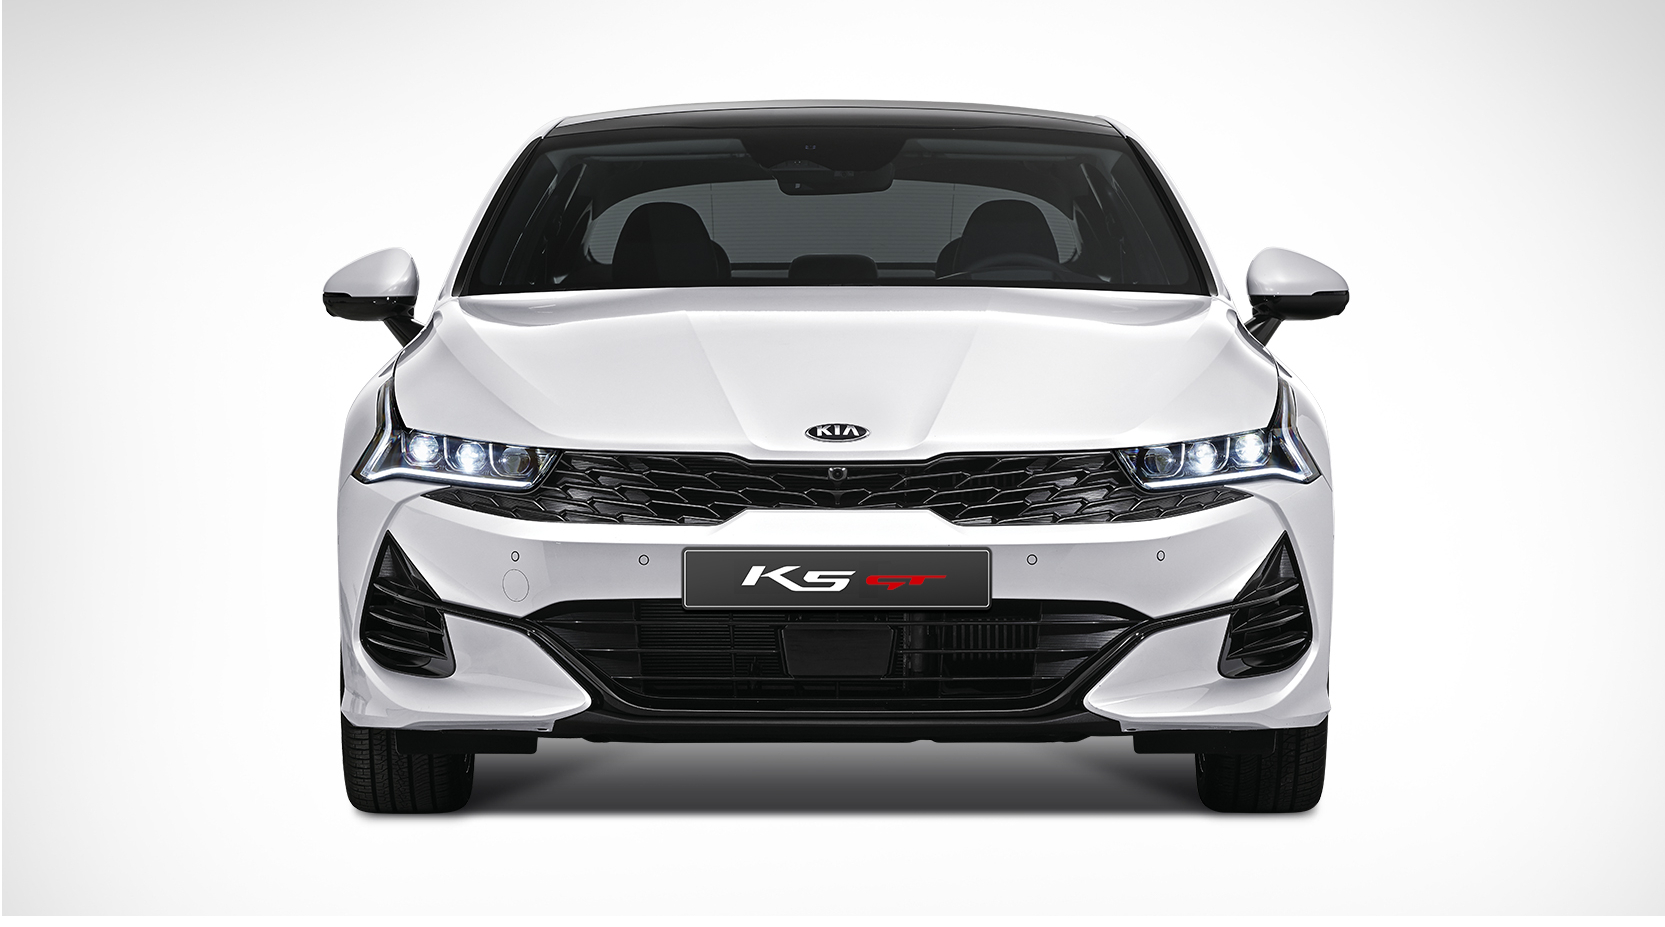 Kia Optima/K5 New Details For North America